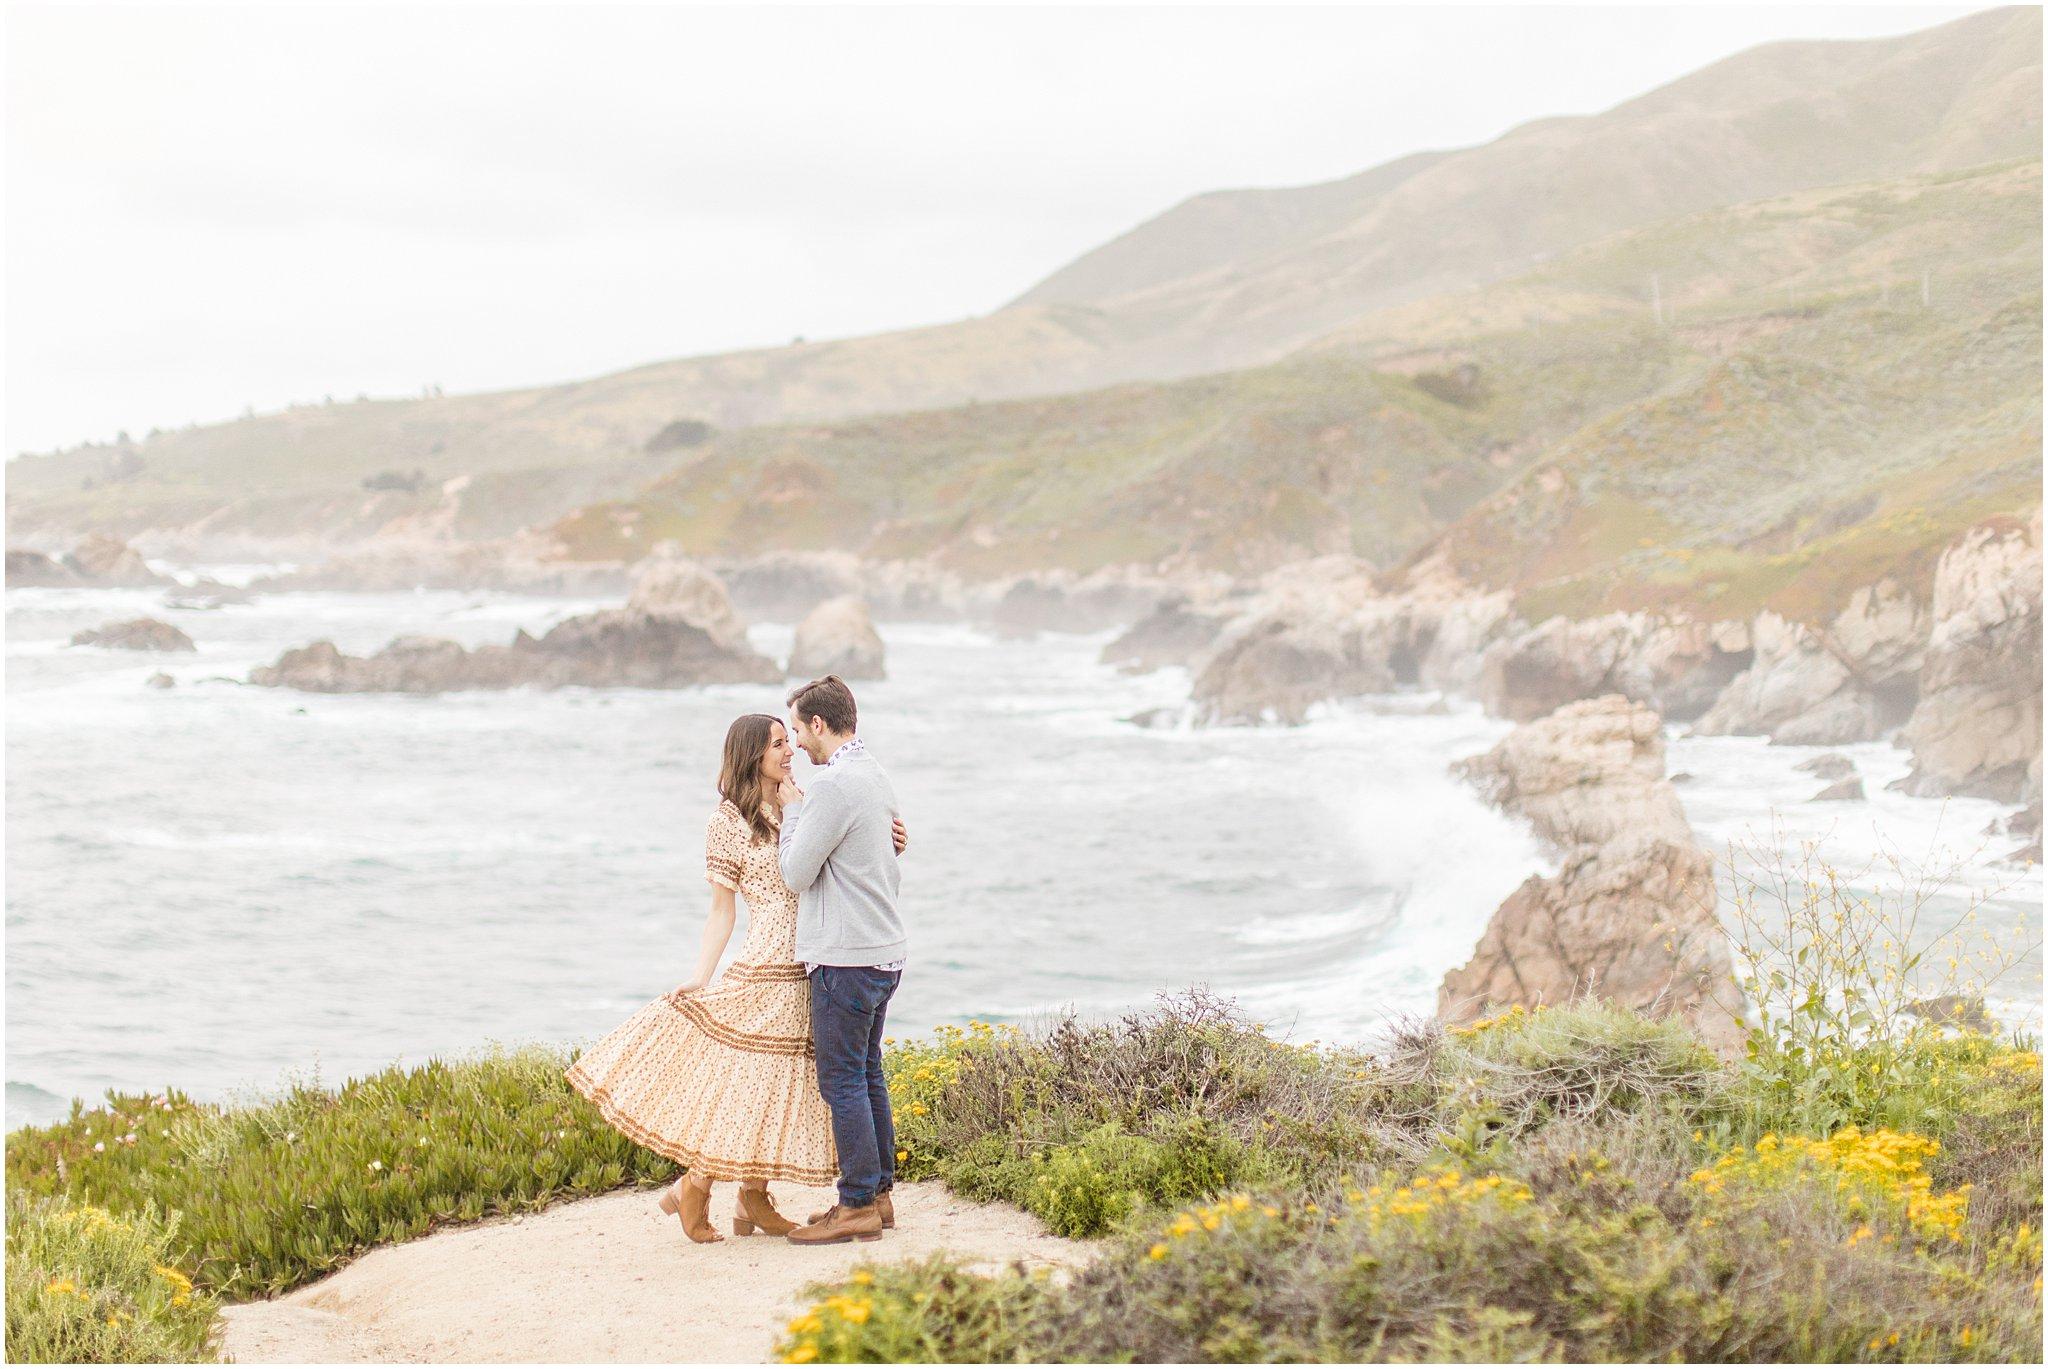 2019 carmel highlands garrapata state park couples portrait session bay area wedding photographer_0021.jpg